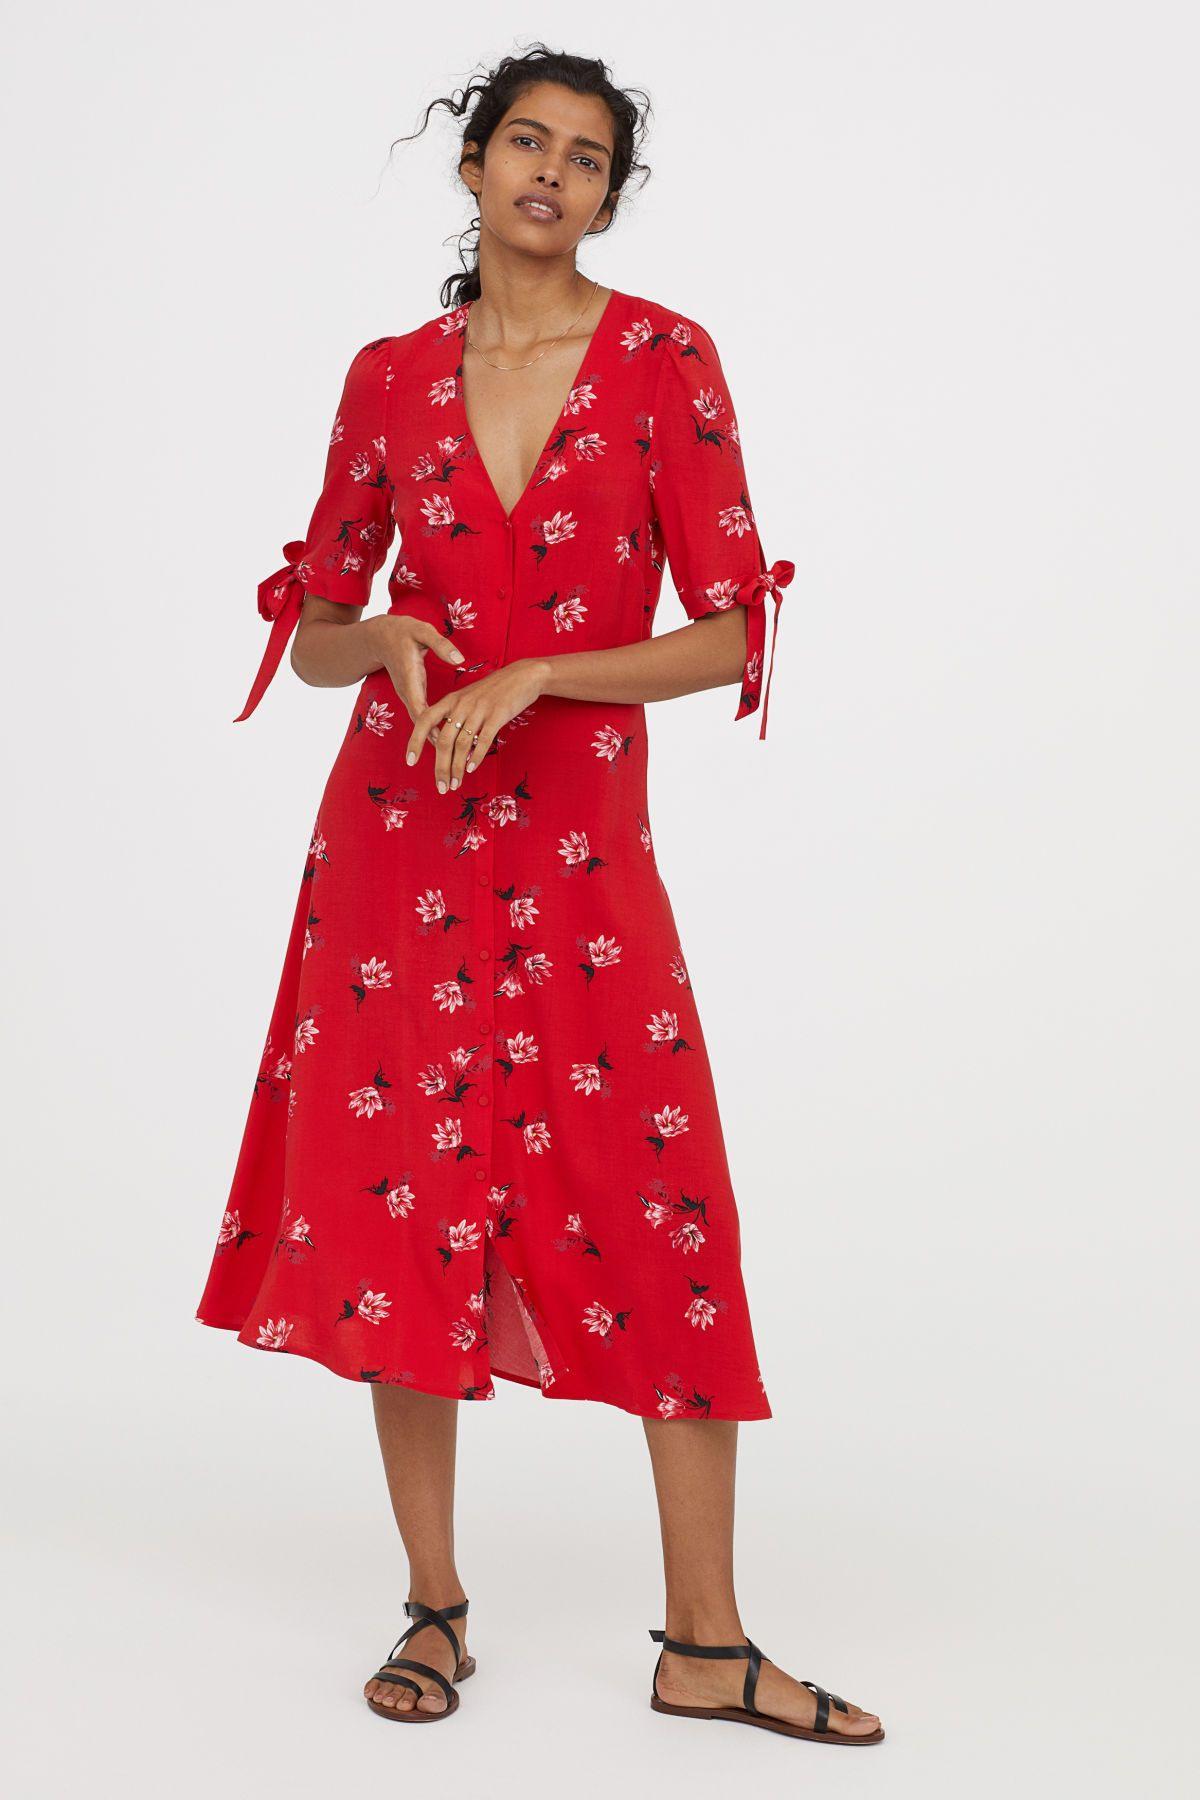 Knielanges Kleid  Rot/Geblümt  Damen  Hm De  Rotes